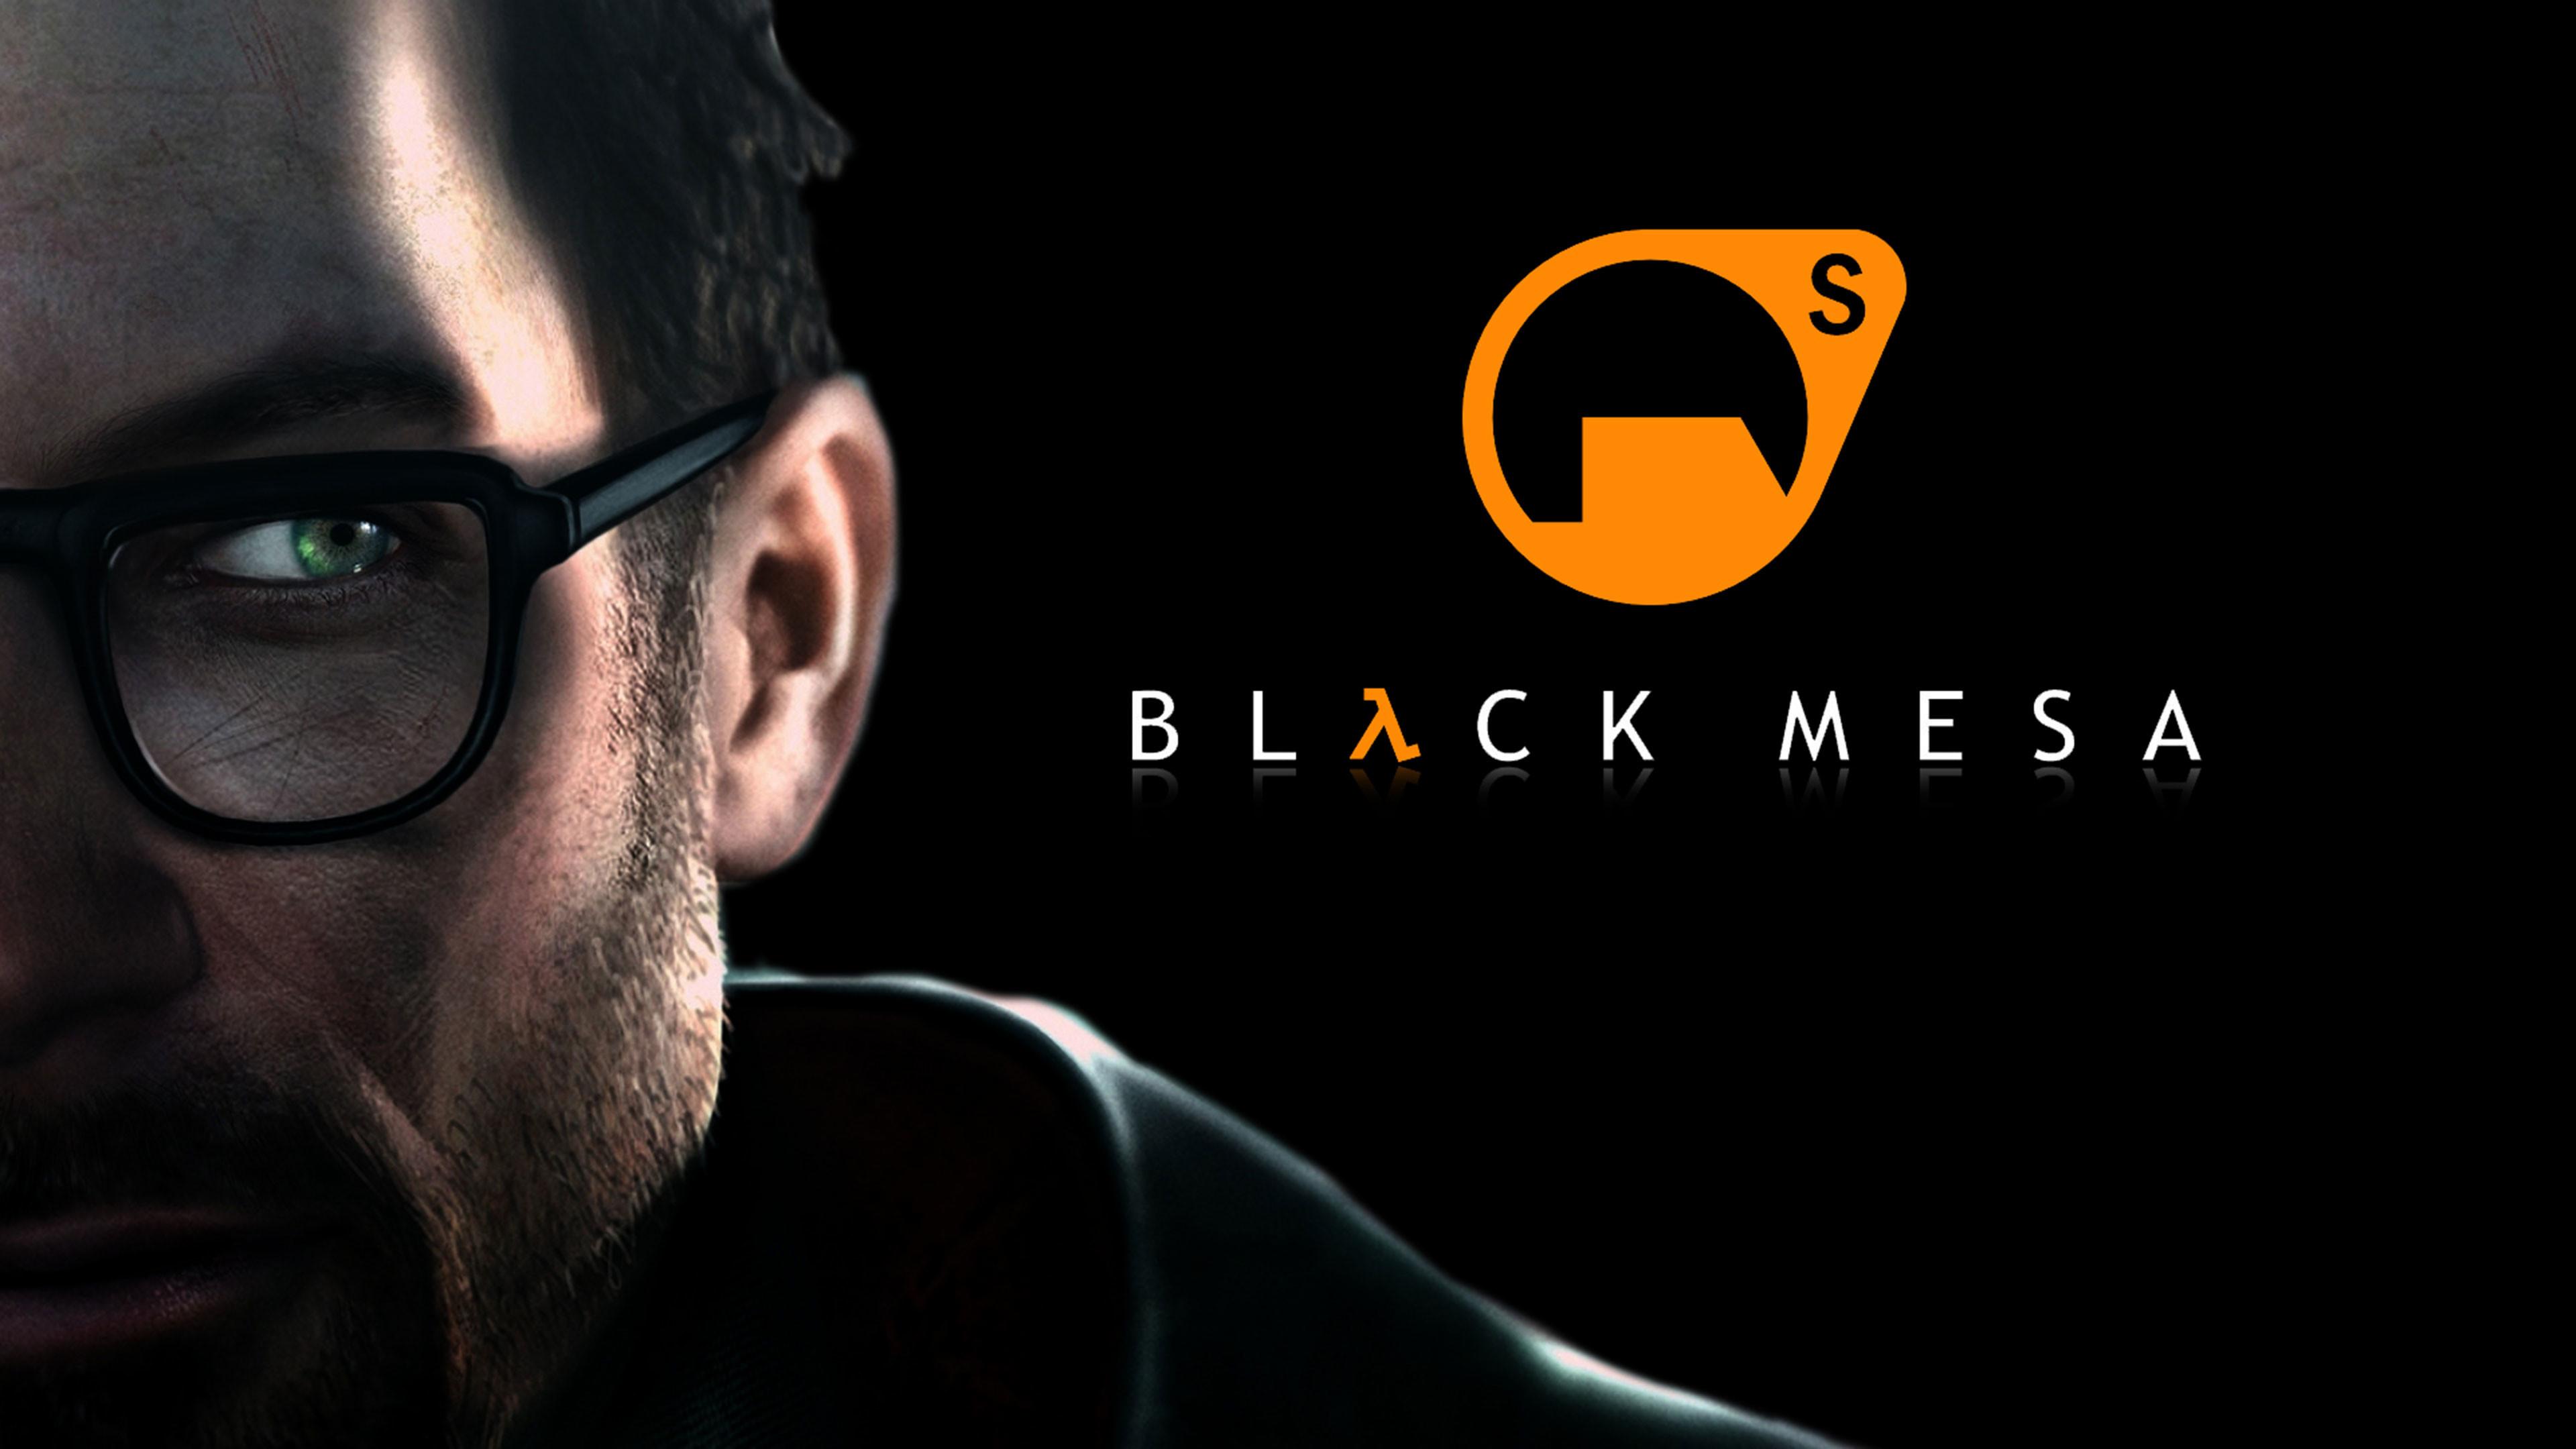 Black Mesa 4K Wallpaper …